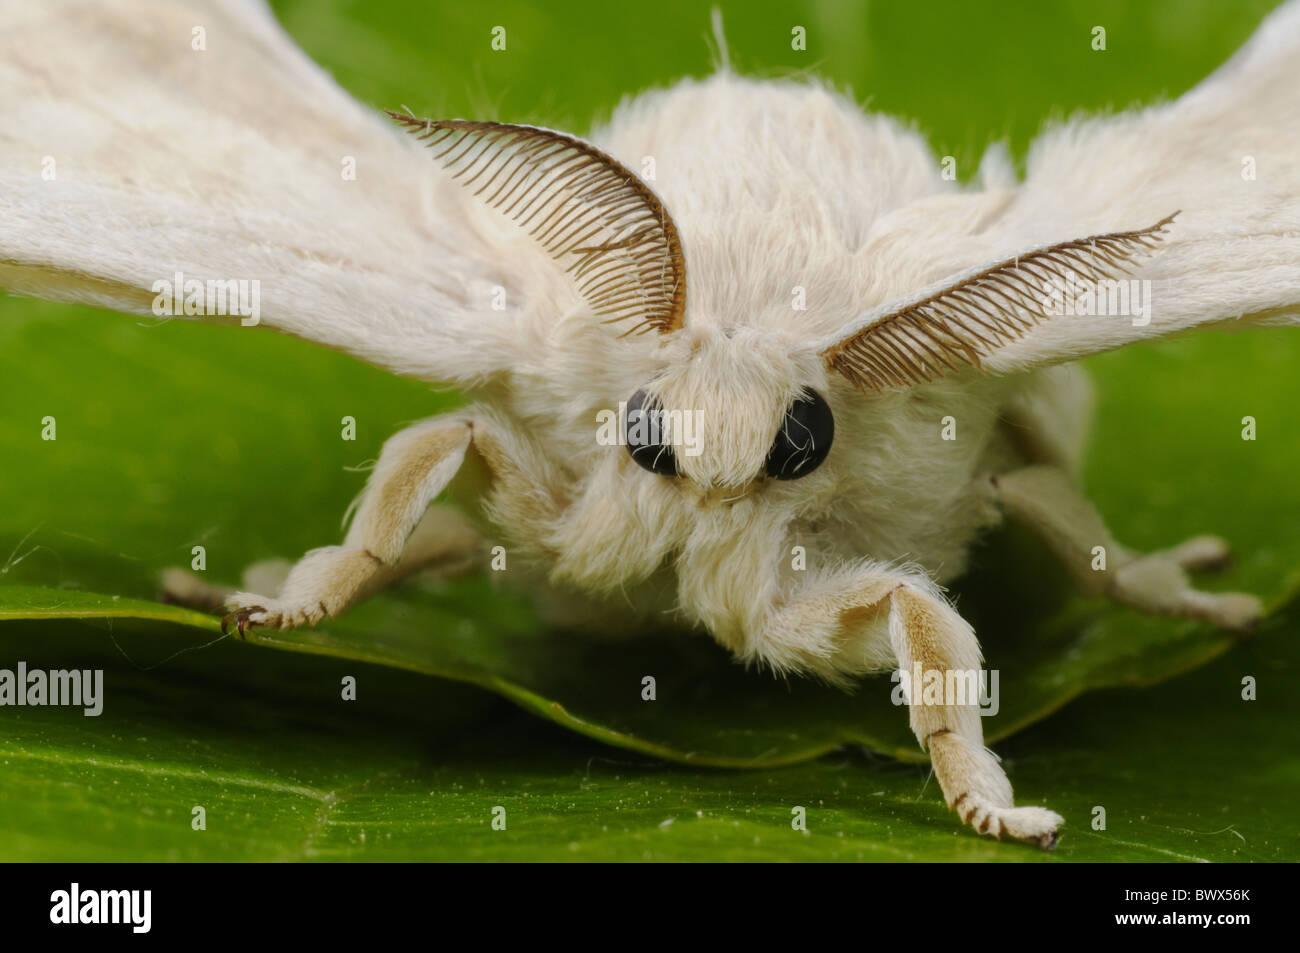 bombyx mori insects invertebrates animal animals moth moths stock